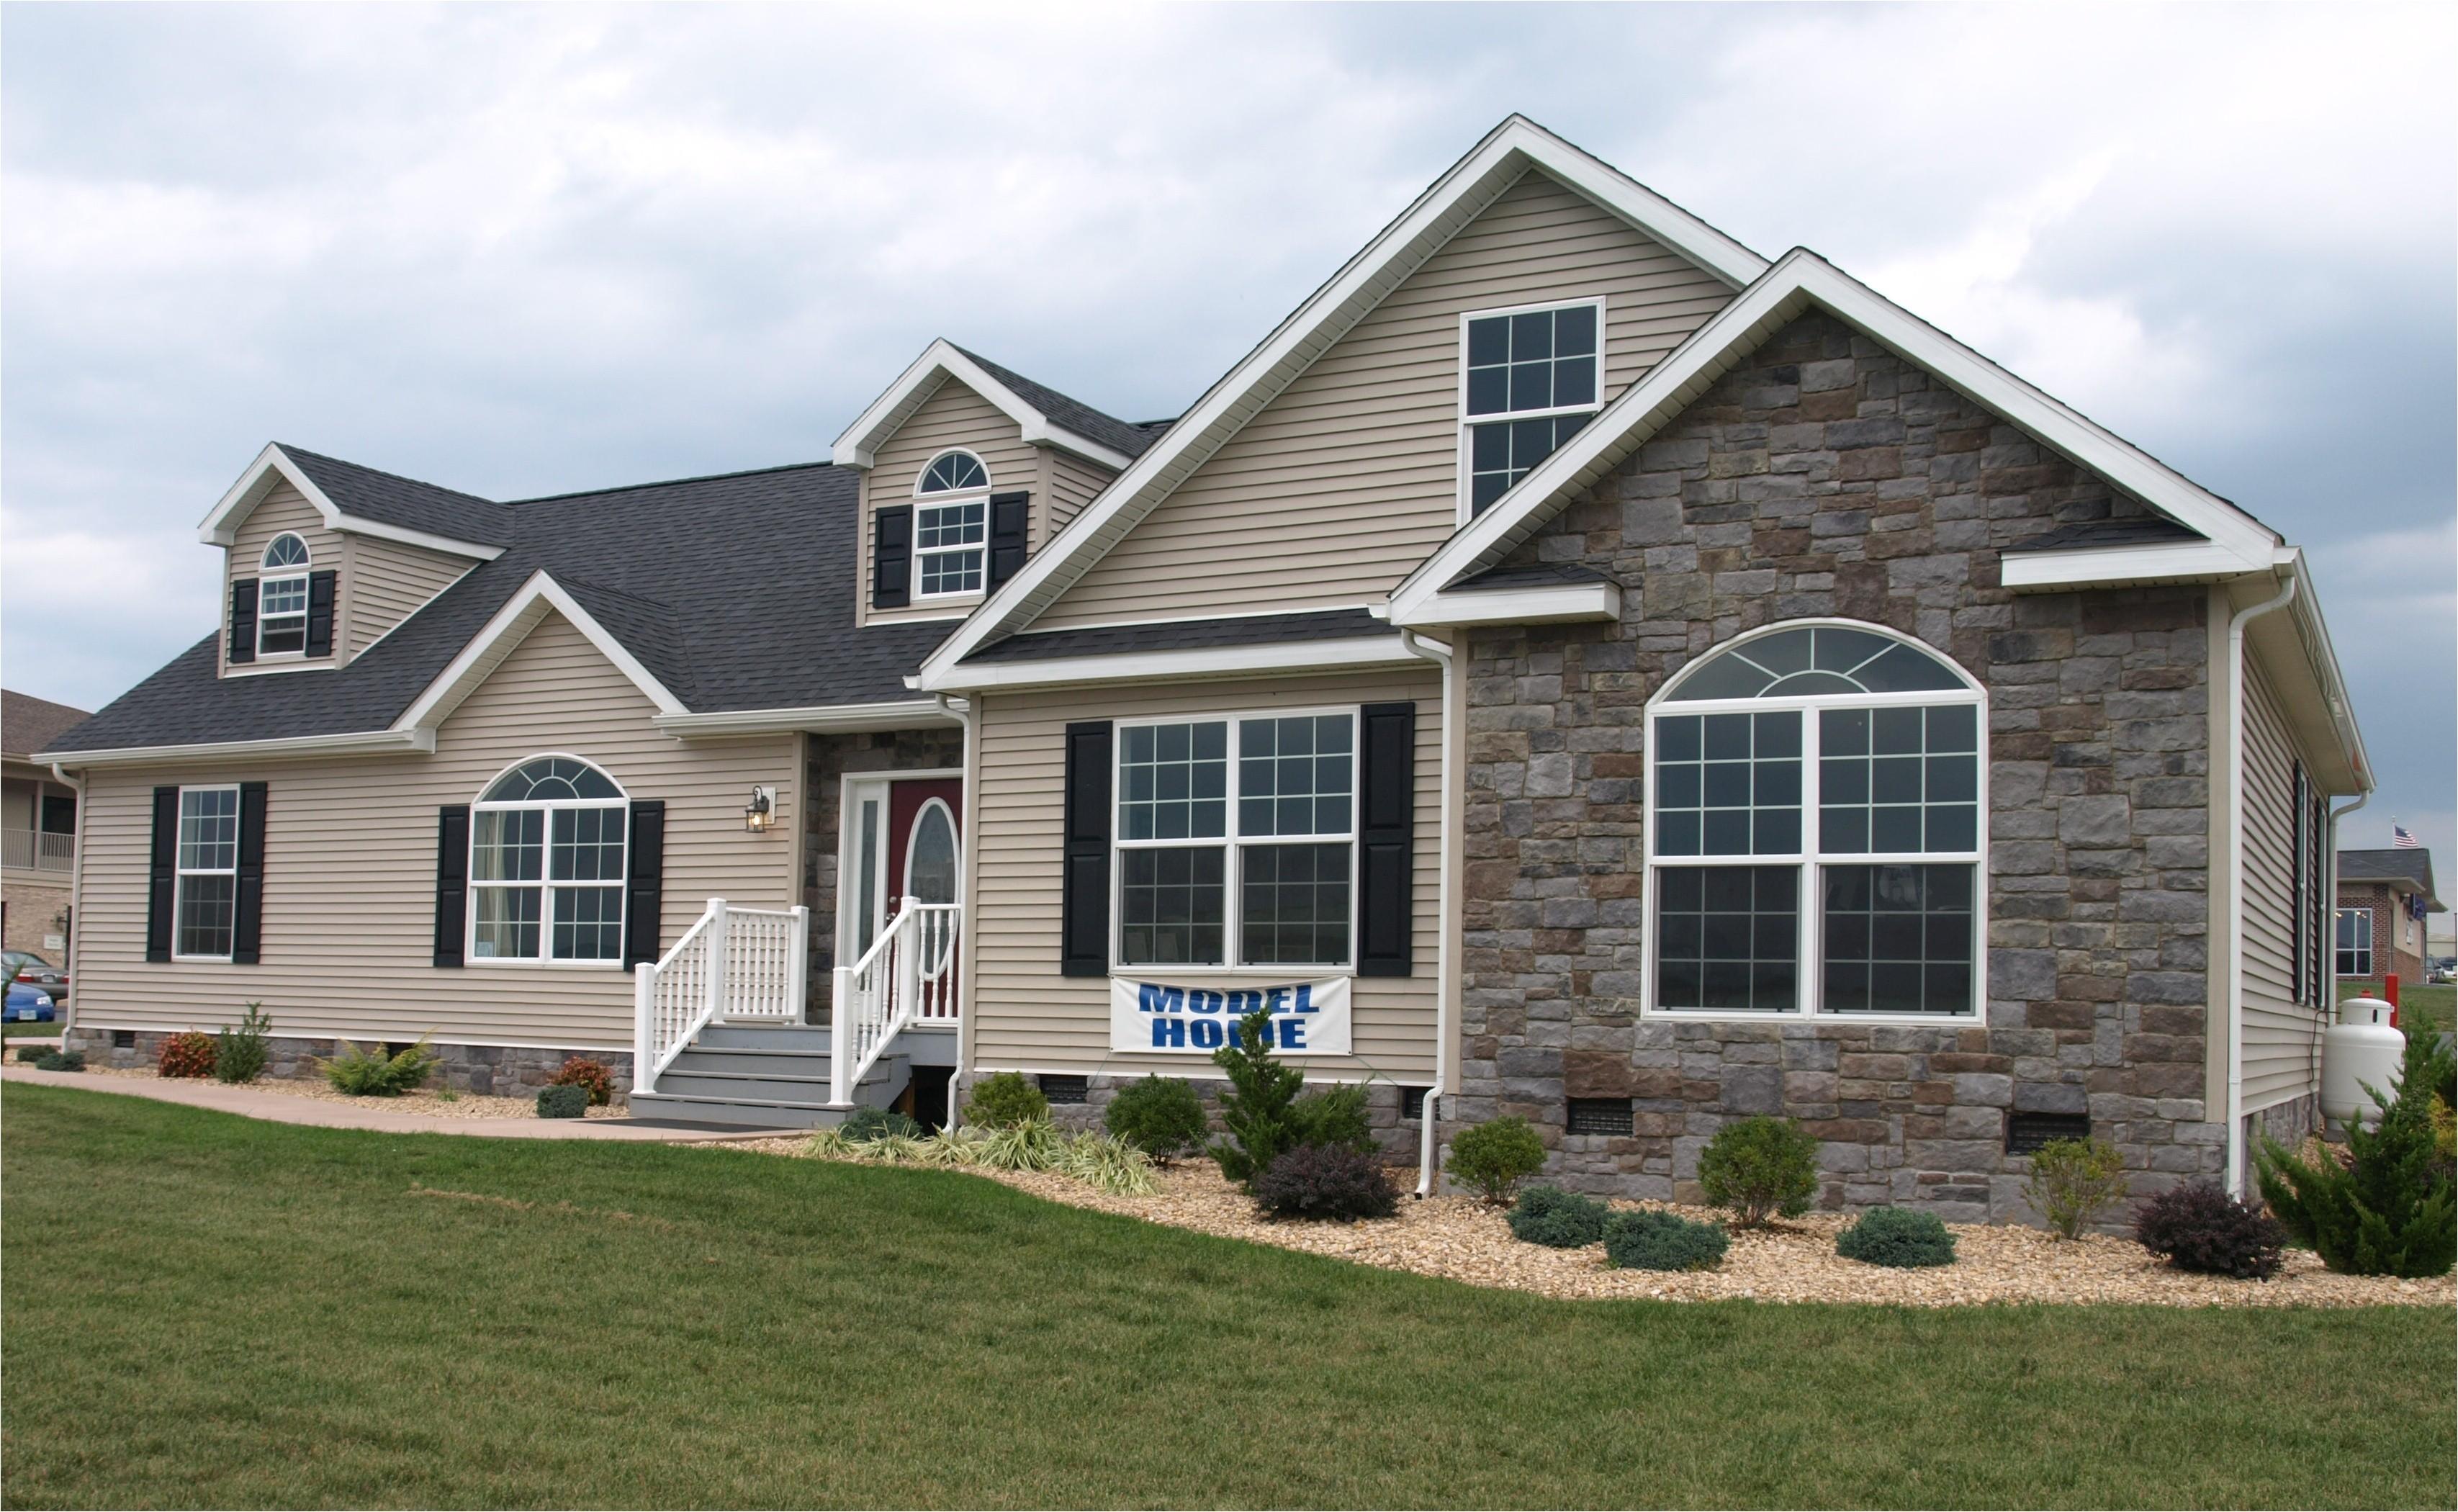 Unique Modular Home Plan Average Price Of Modular Homes